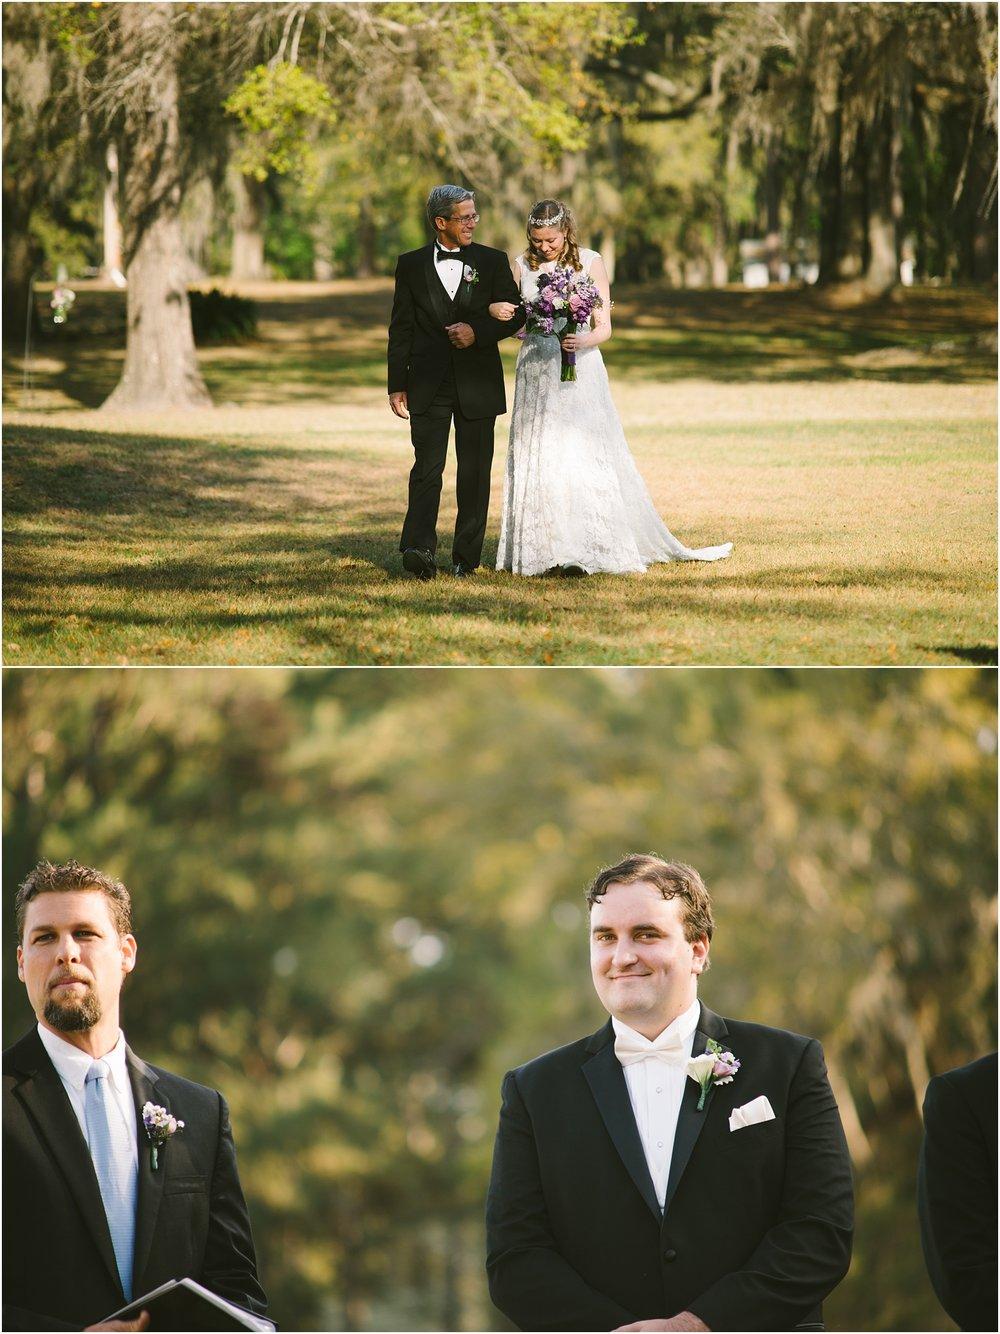 bradleys-pond-tallahassee-wedding-March-2017_0043.jpg